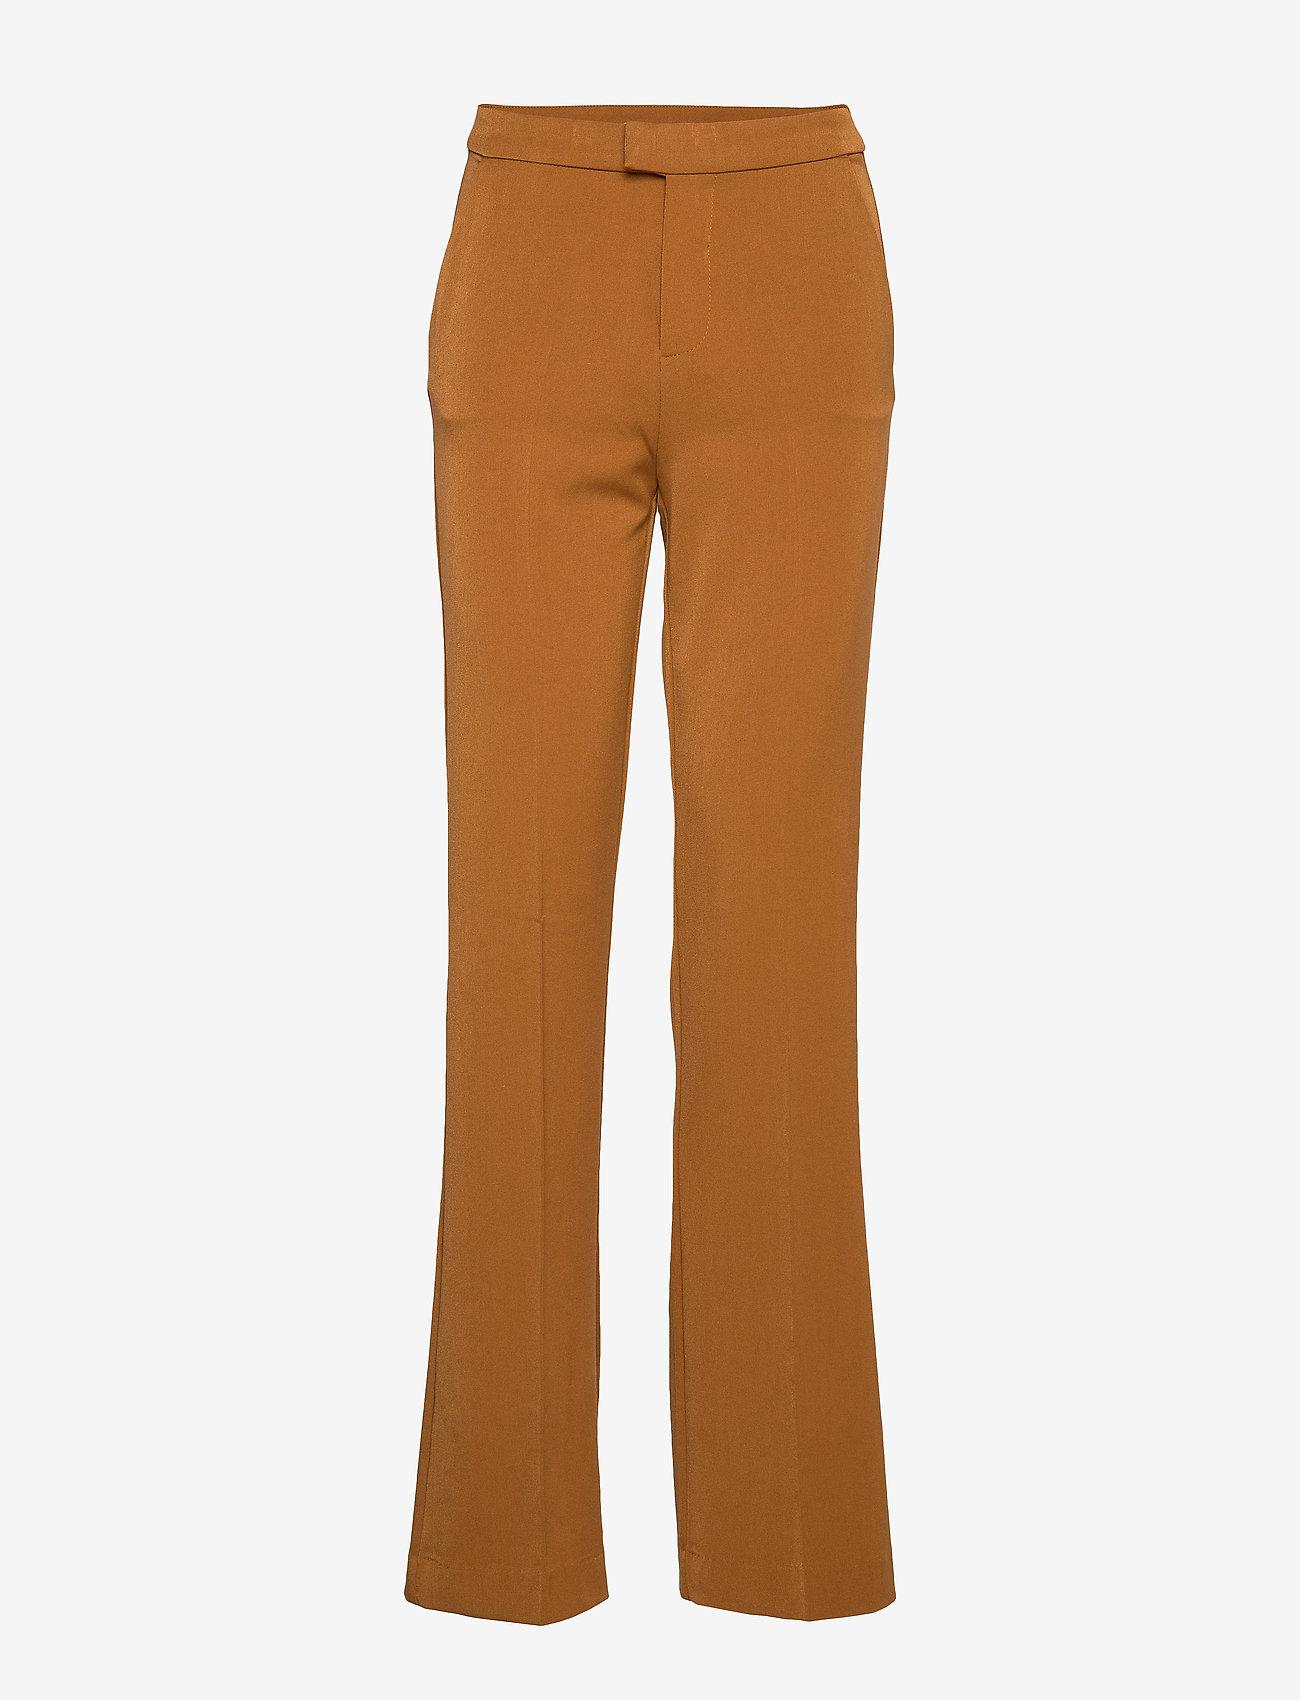 Camilla Pihl - Bankers - broeken med straight ben - camel - 0